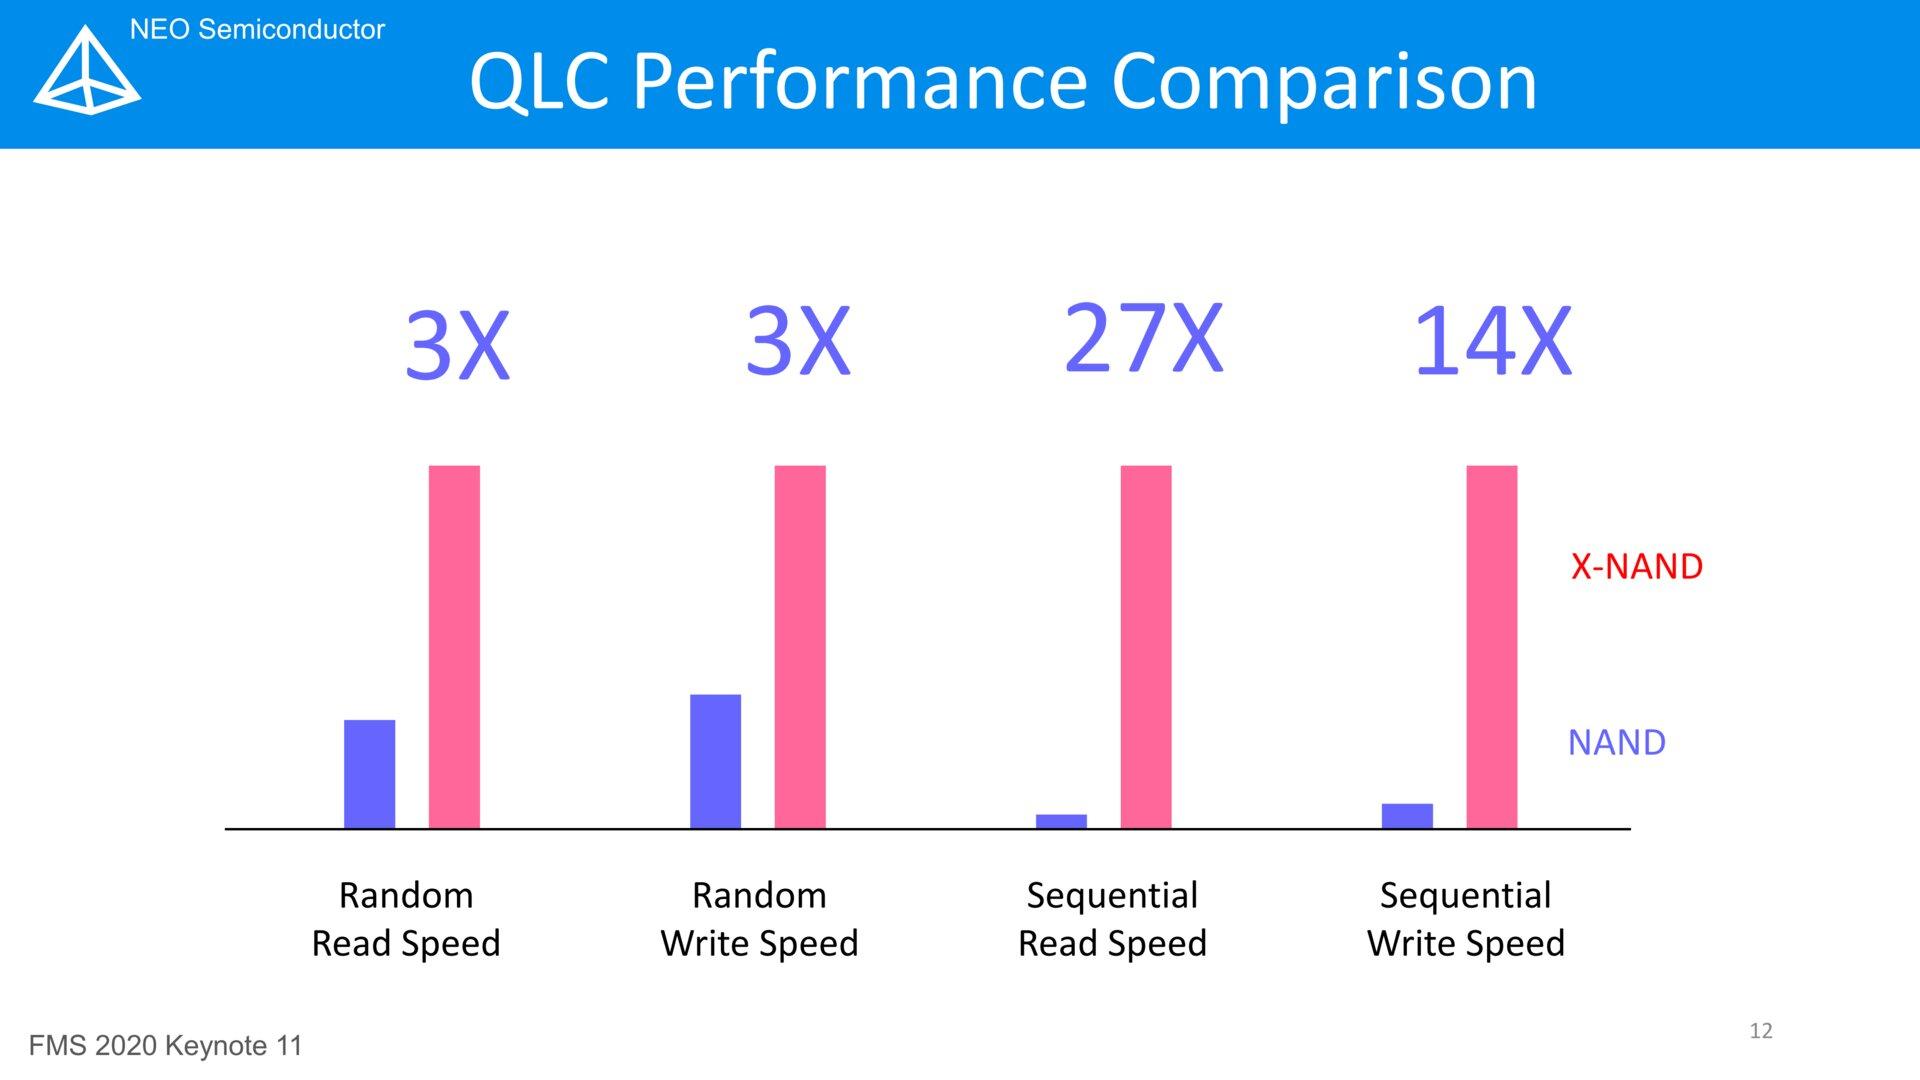 Leistungsprognose (QLC vs. X-NAND QLC)